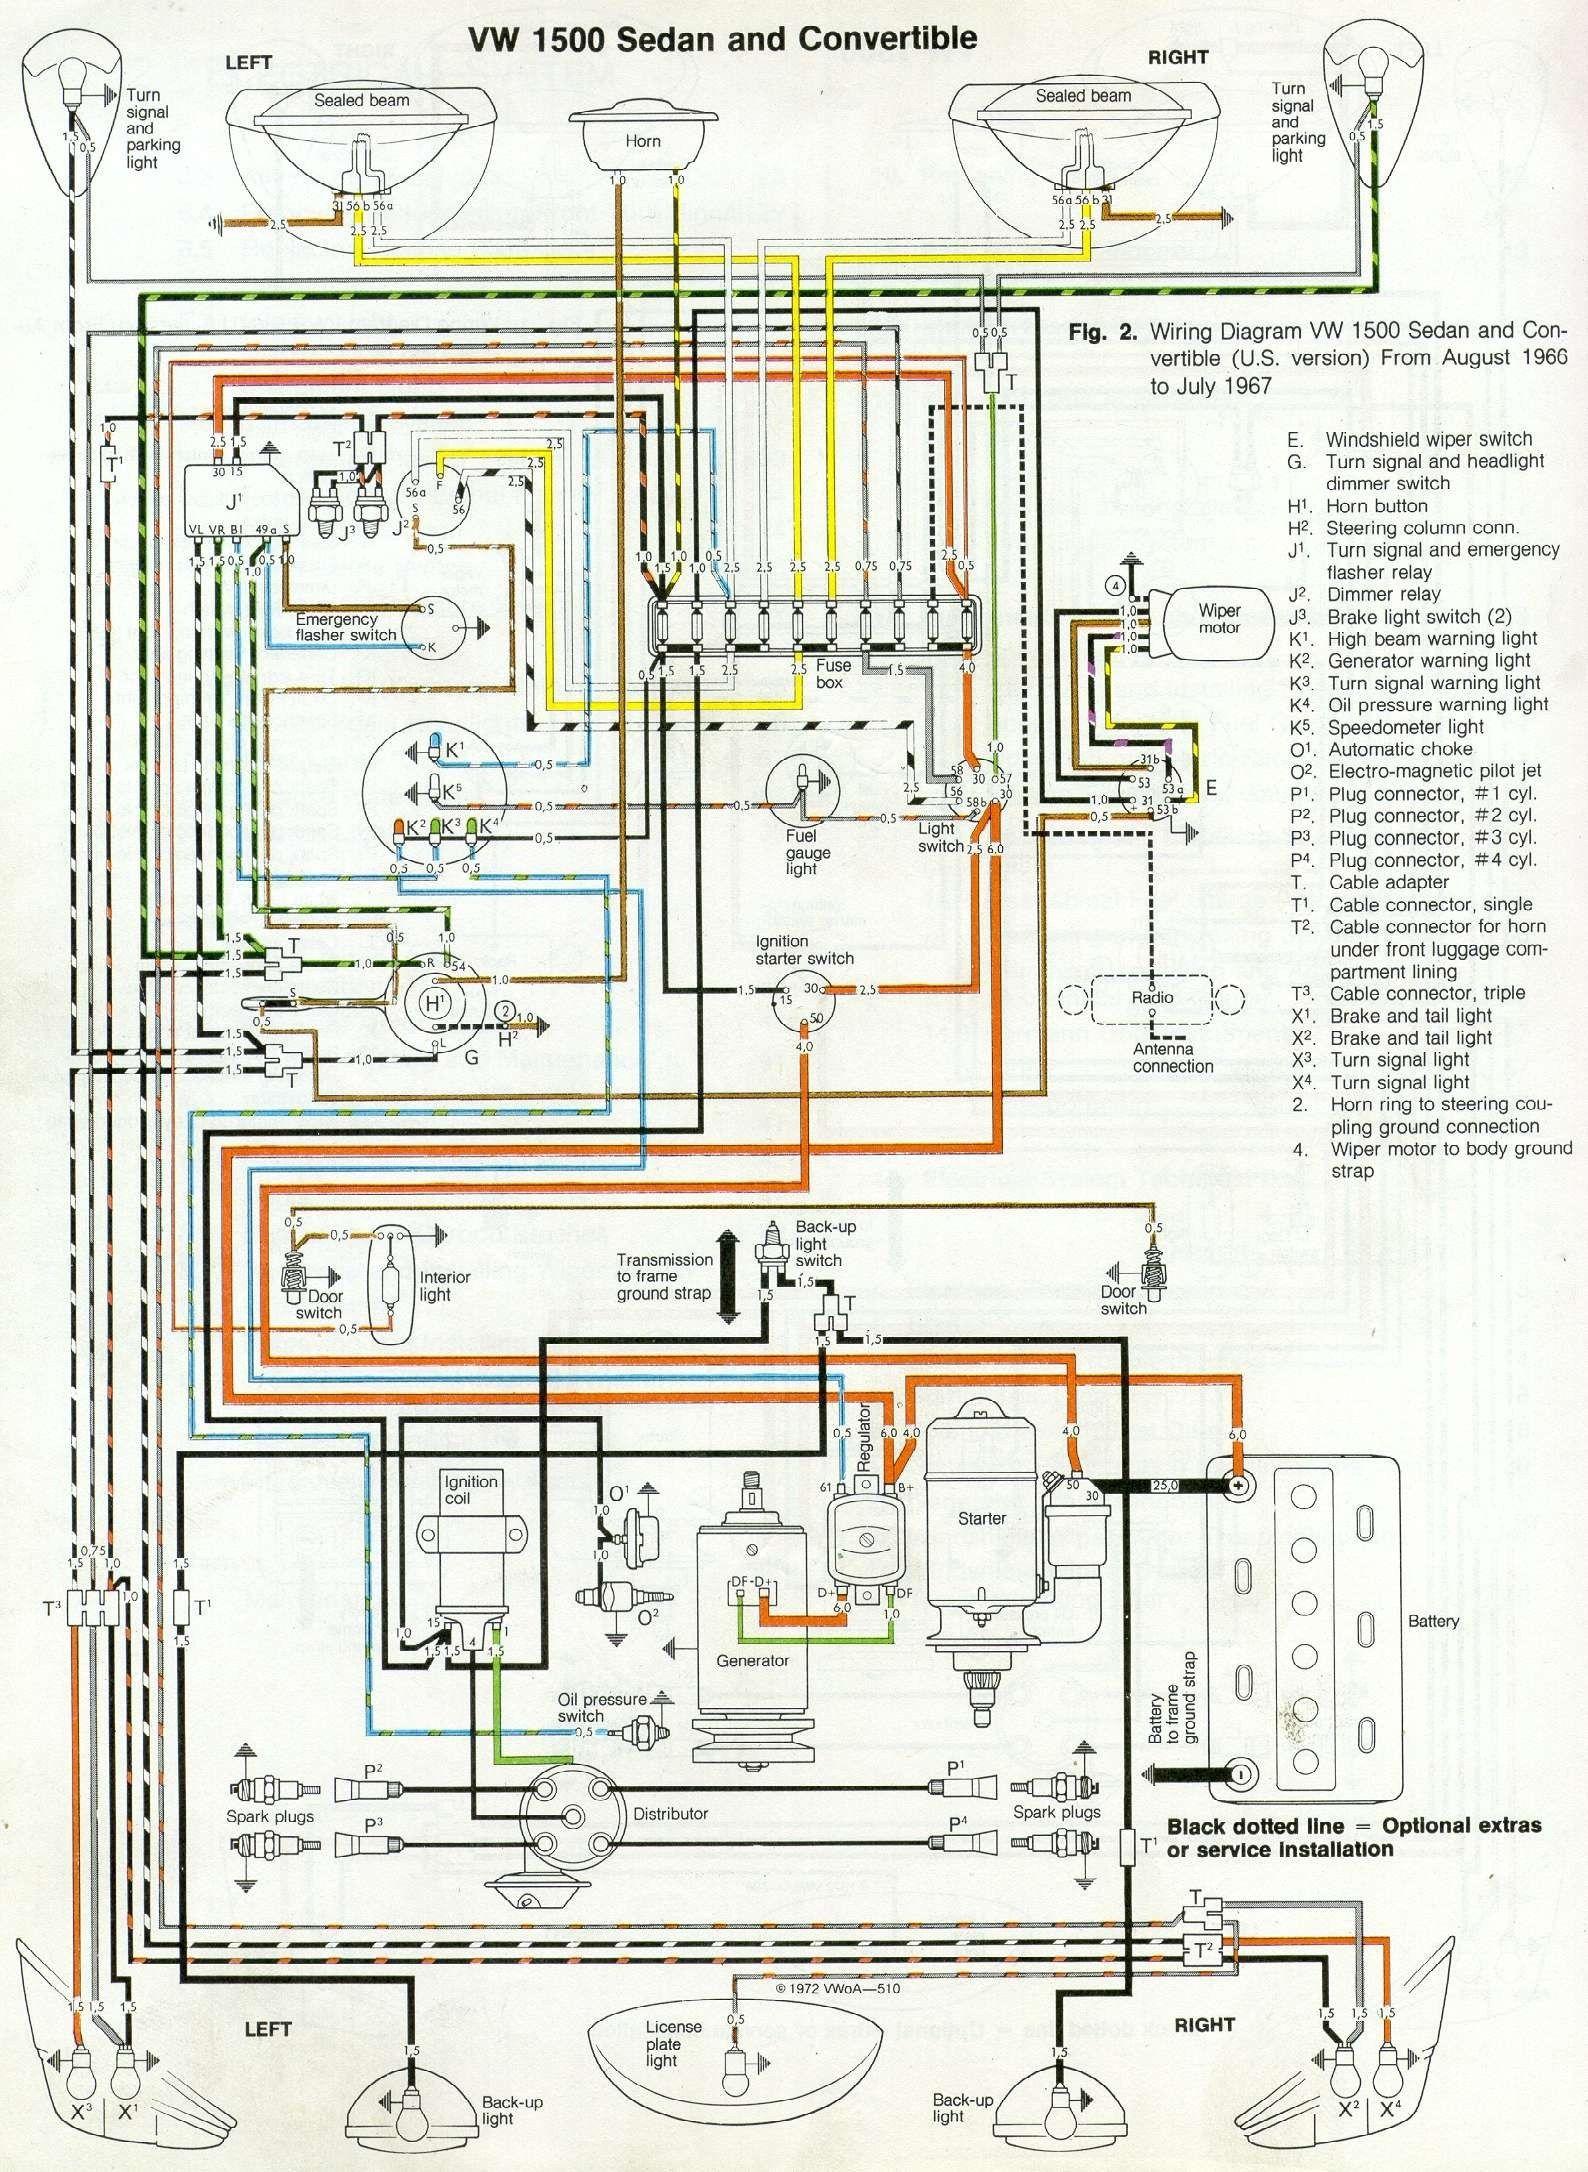 medium resolution of correct 67 vw beetle wiring diagram courtesy of 1967beetle com